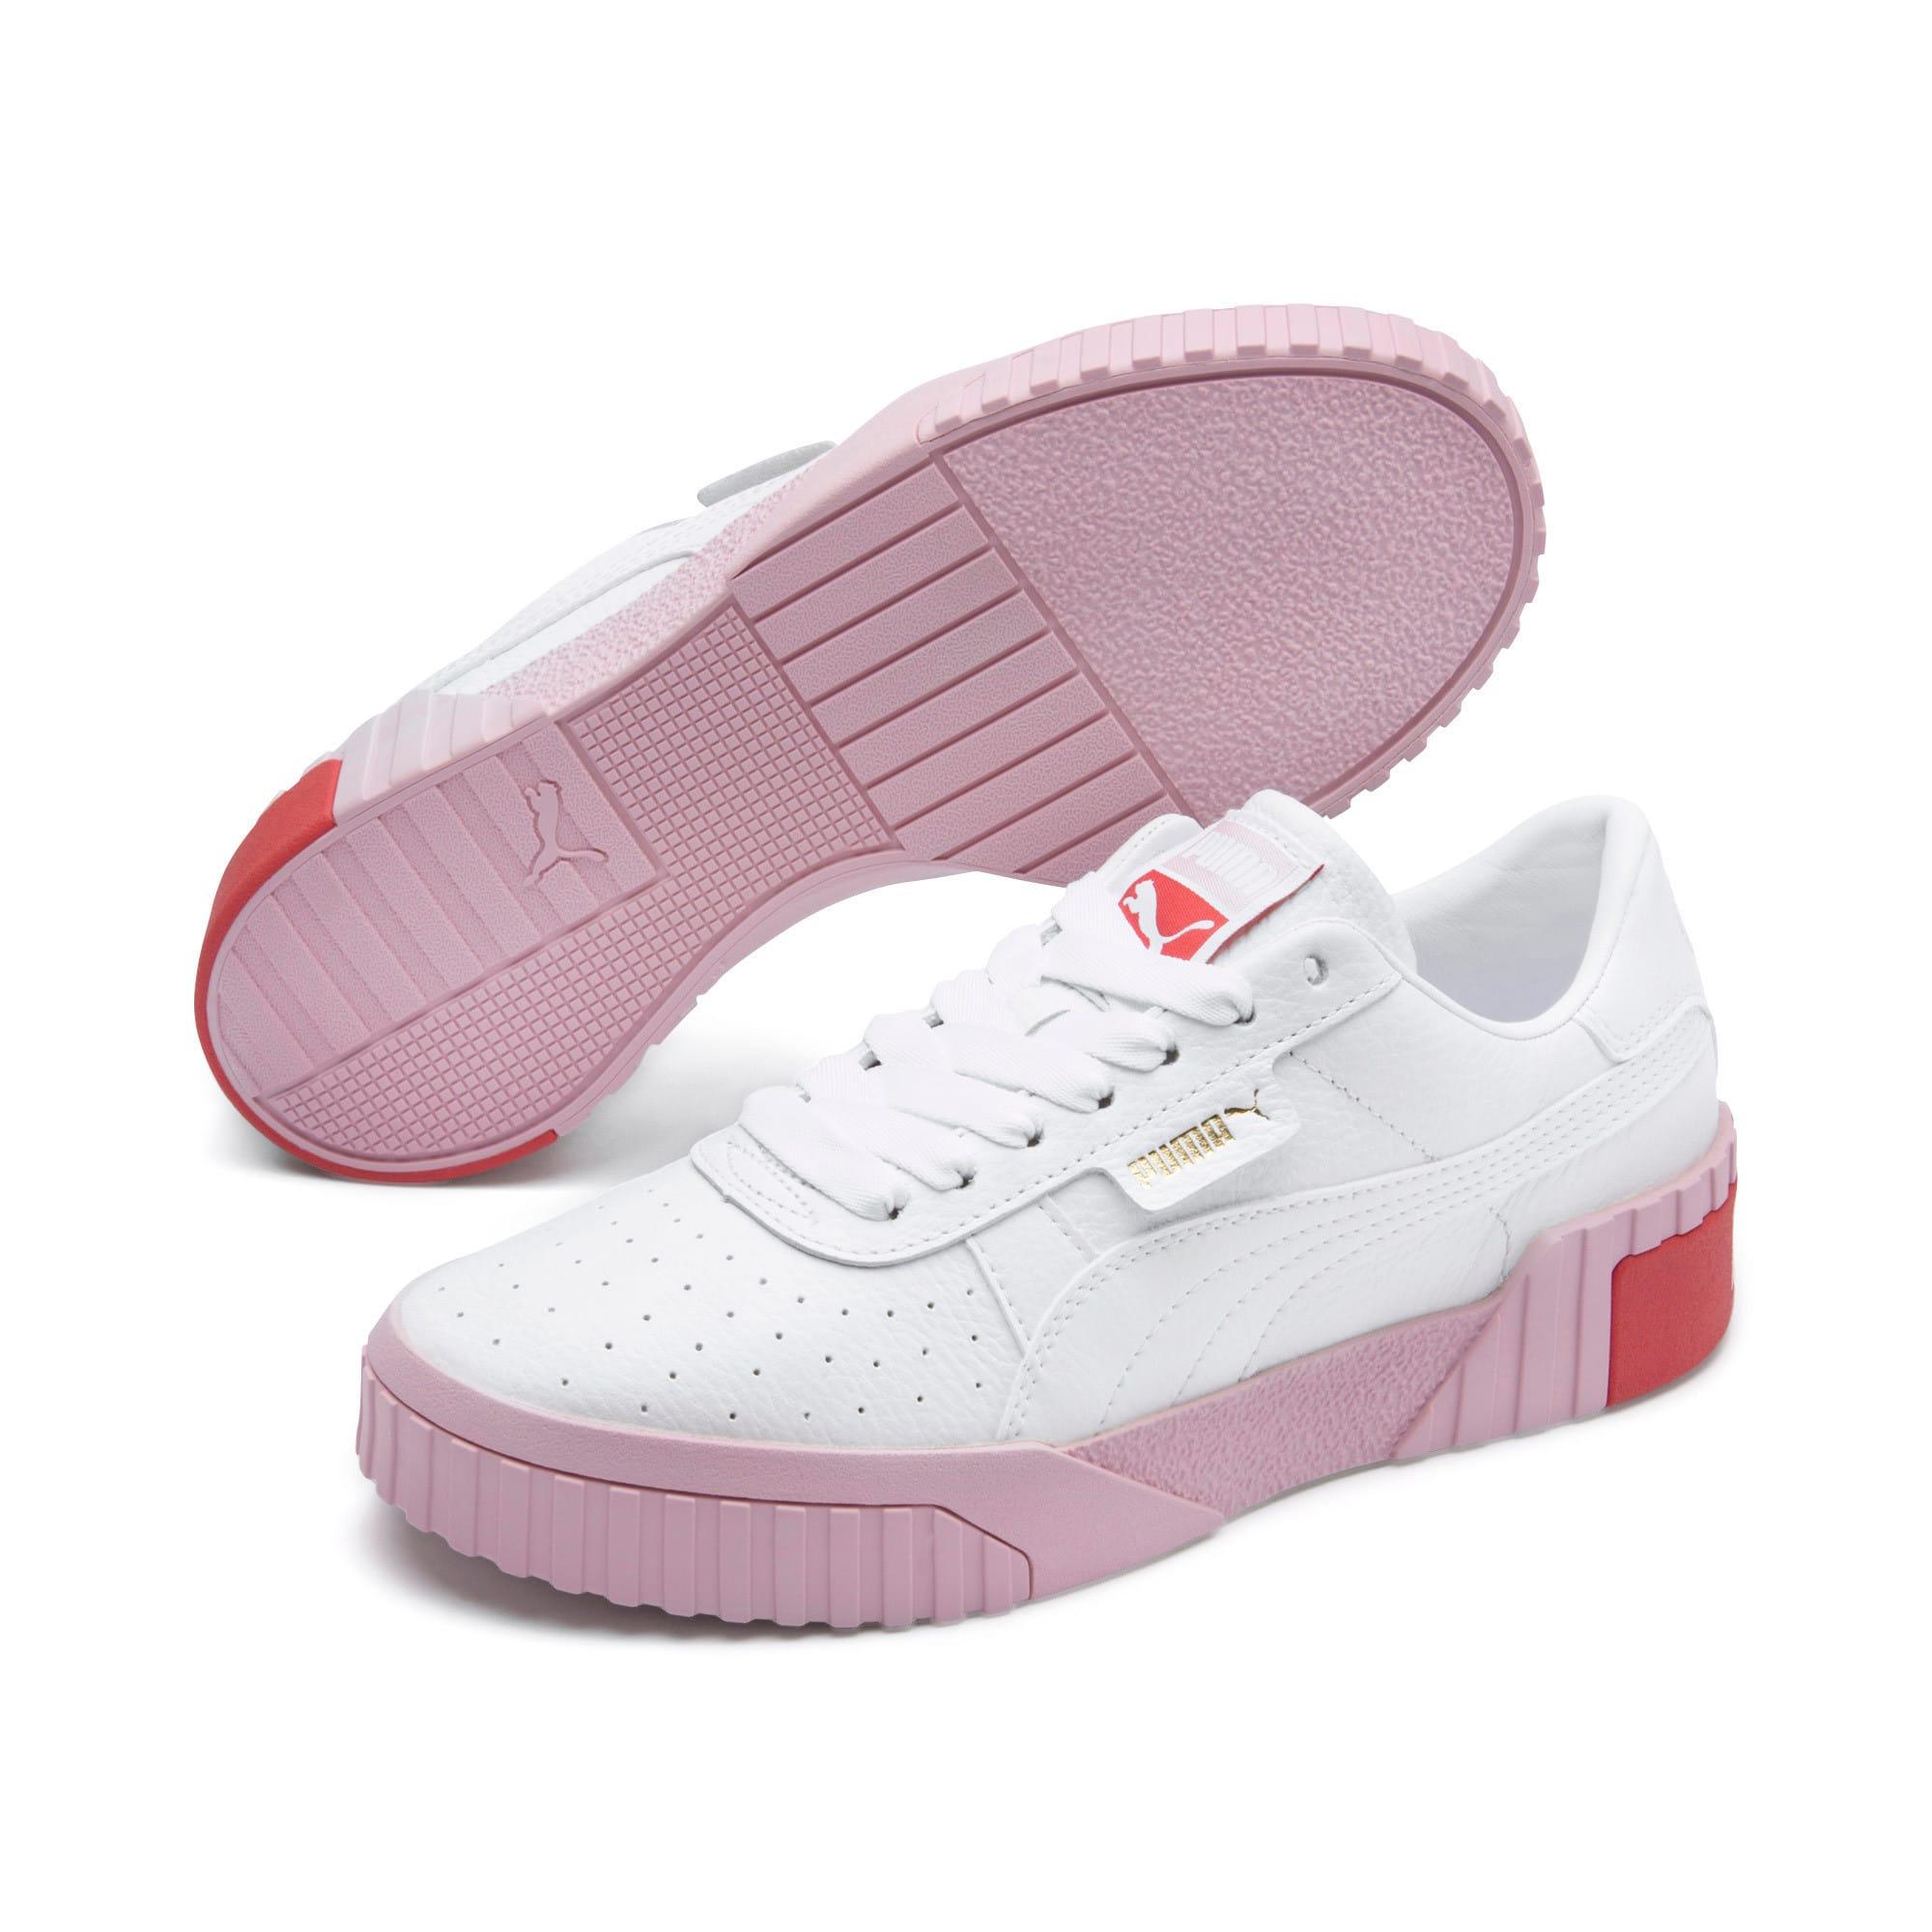 Thumbnail 3 of Basket Cali pour femme, Puma White-Pale Pink, medium